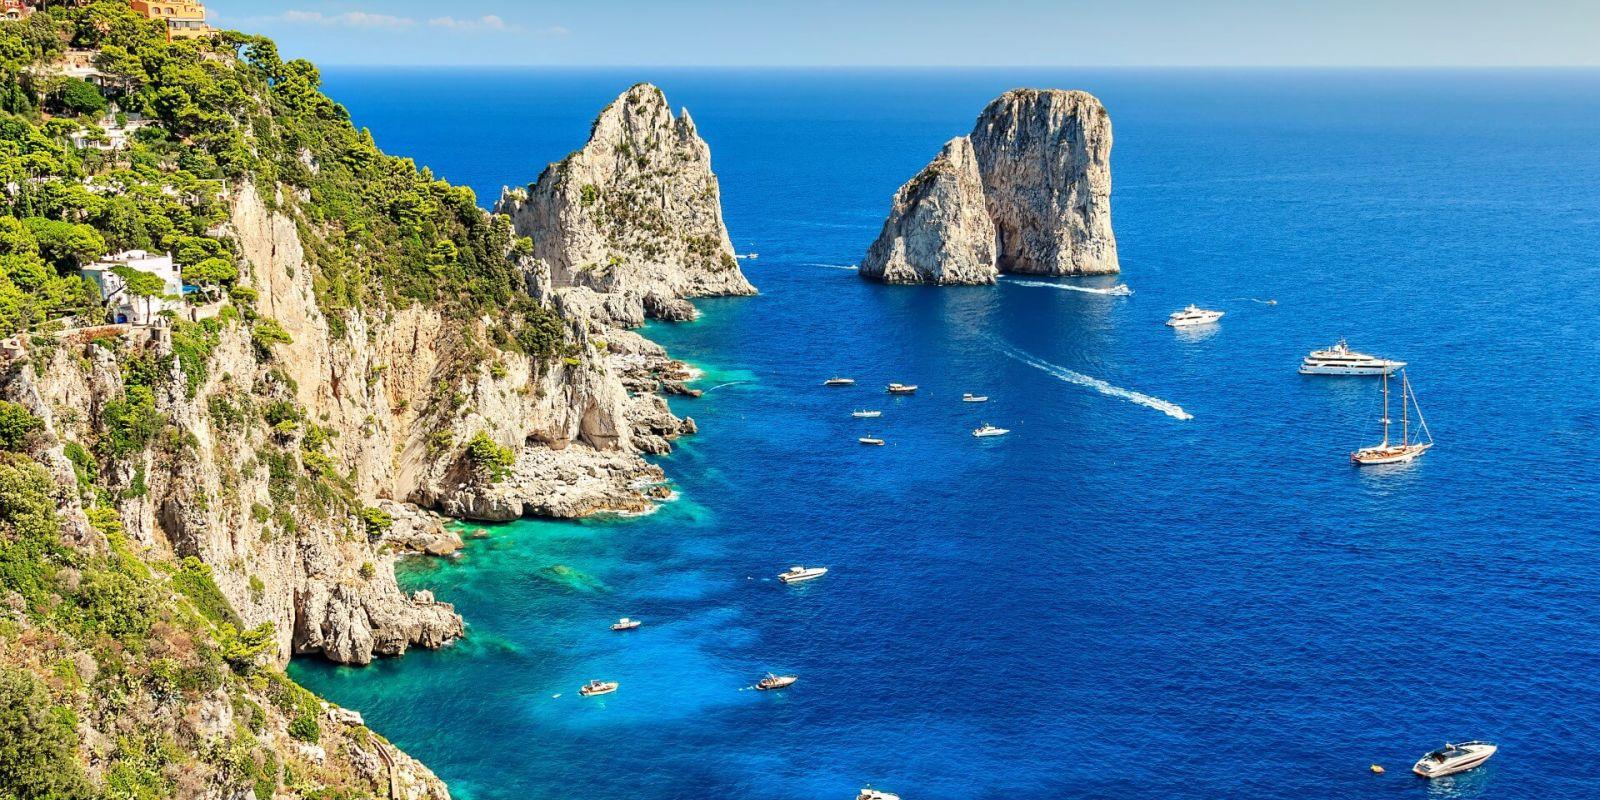 https://www.talamare.fr/medias/Les rochers Faraglioni de l'île de Capri